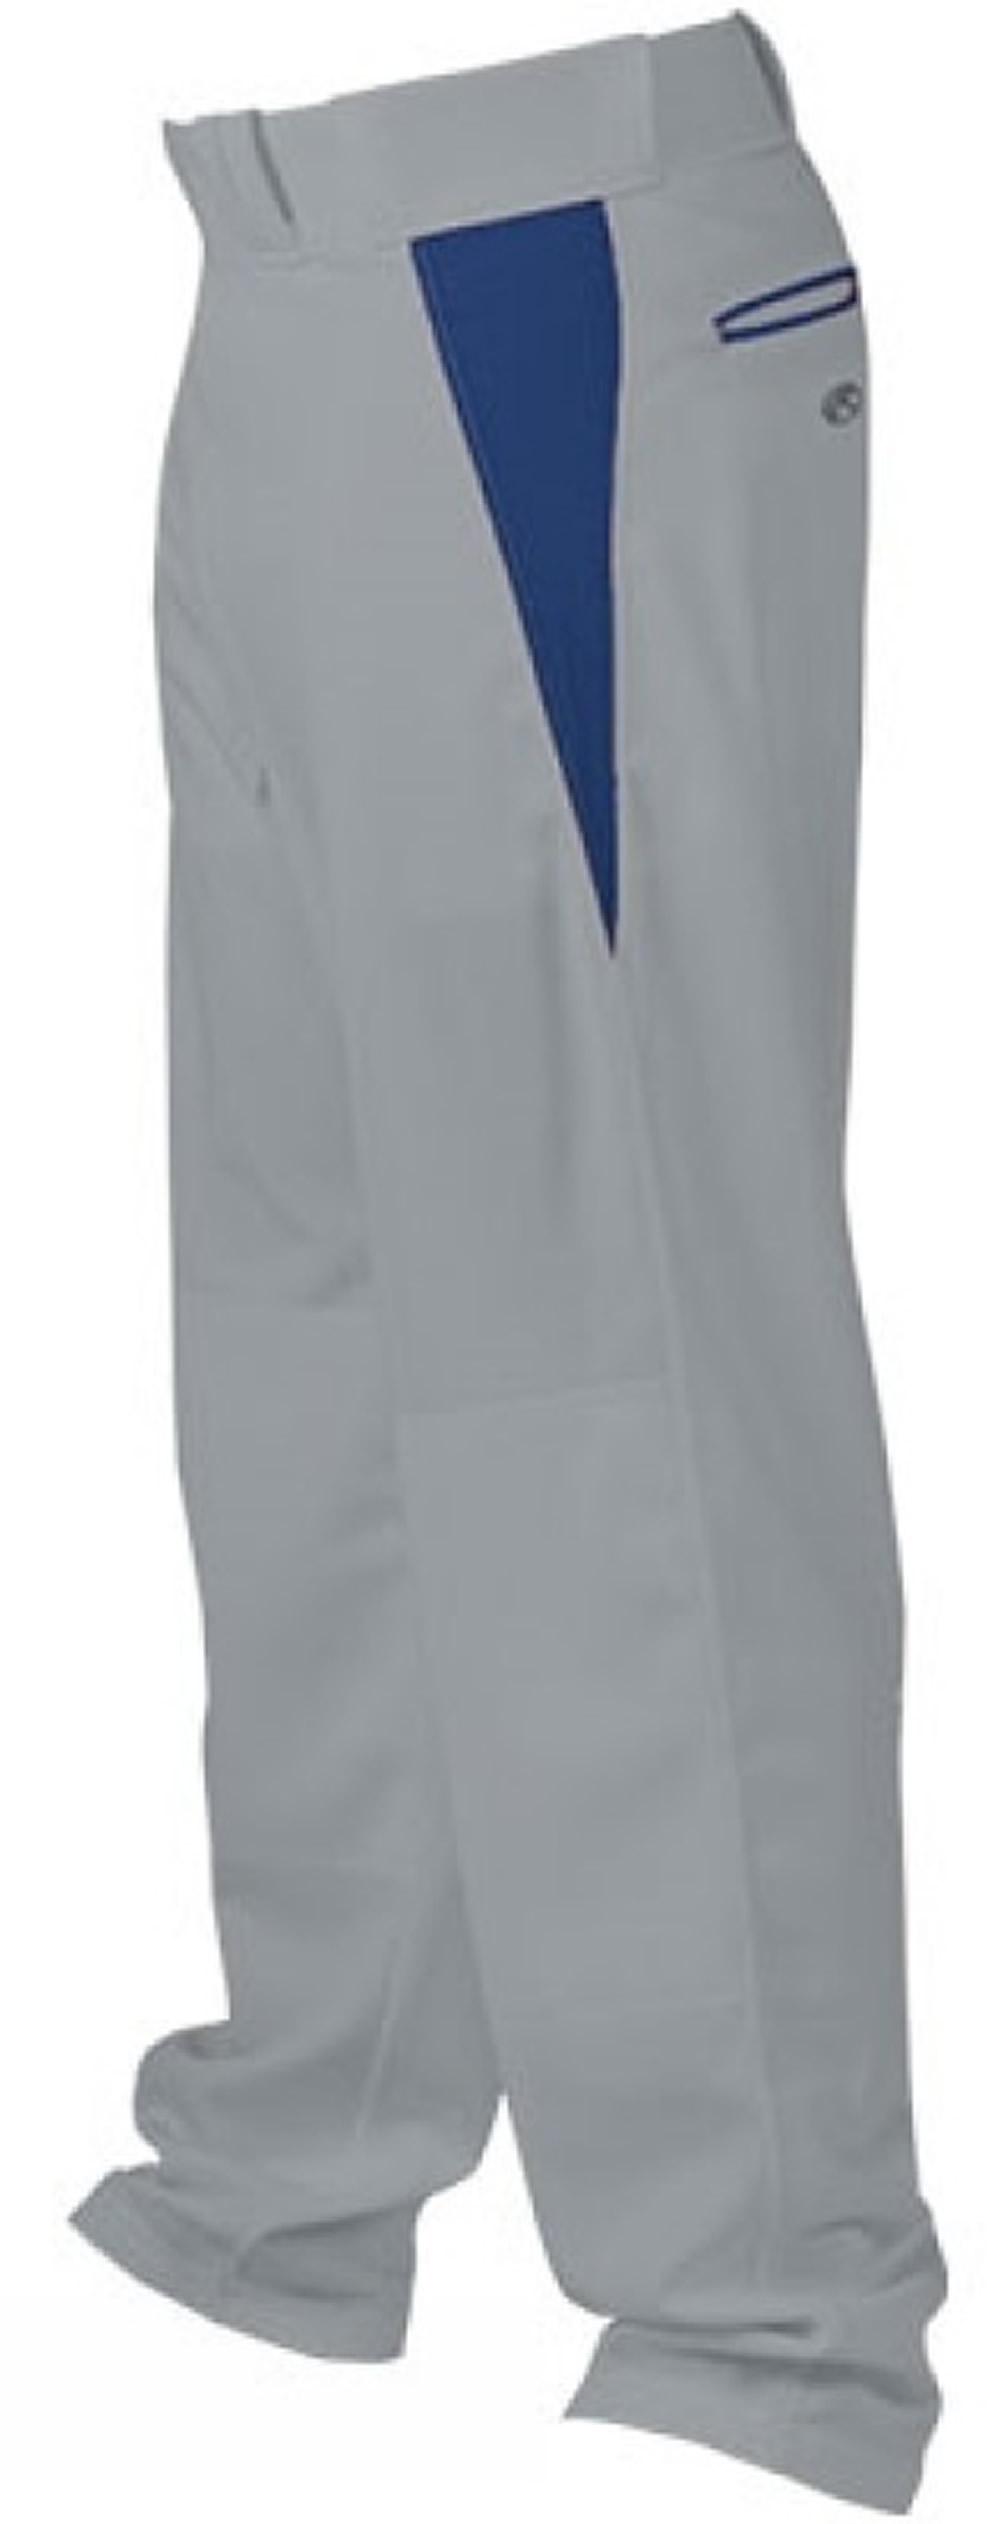 Rawlings Adult Pro Flare Baseball Pants 93